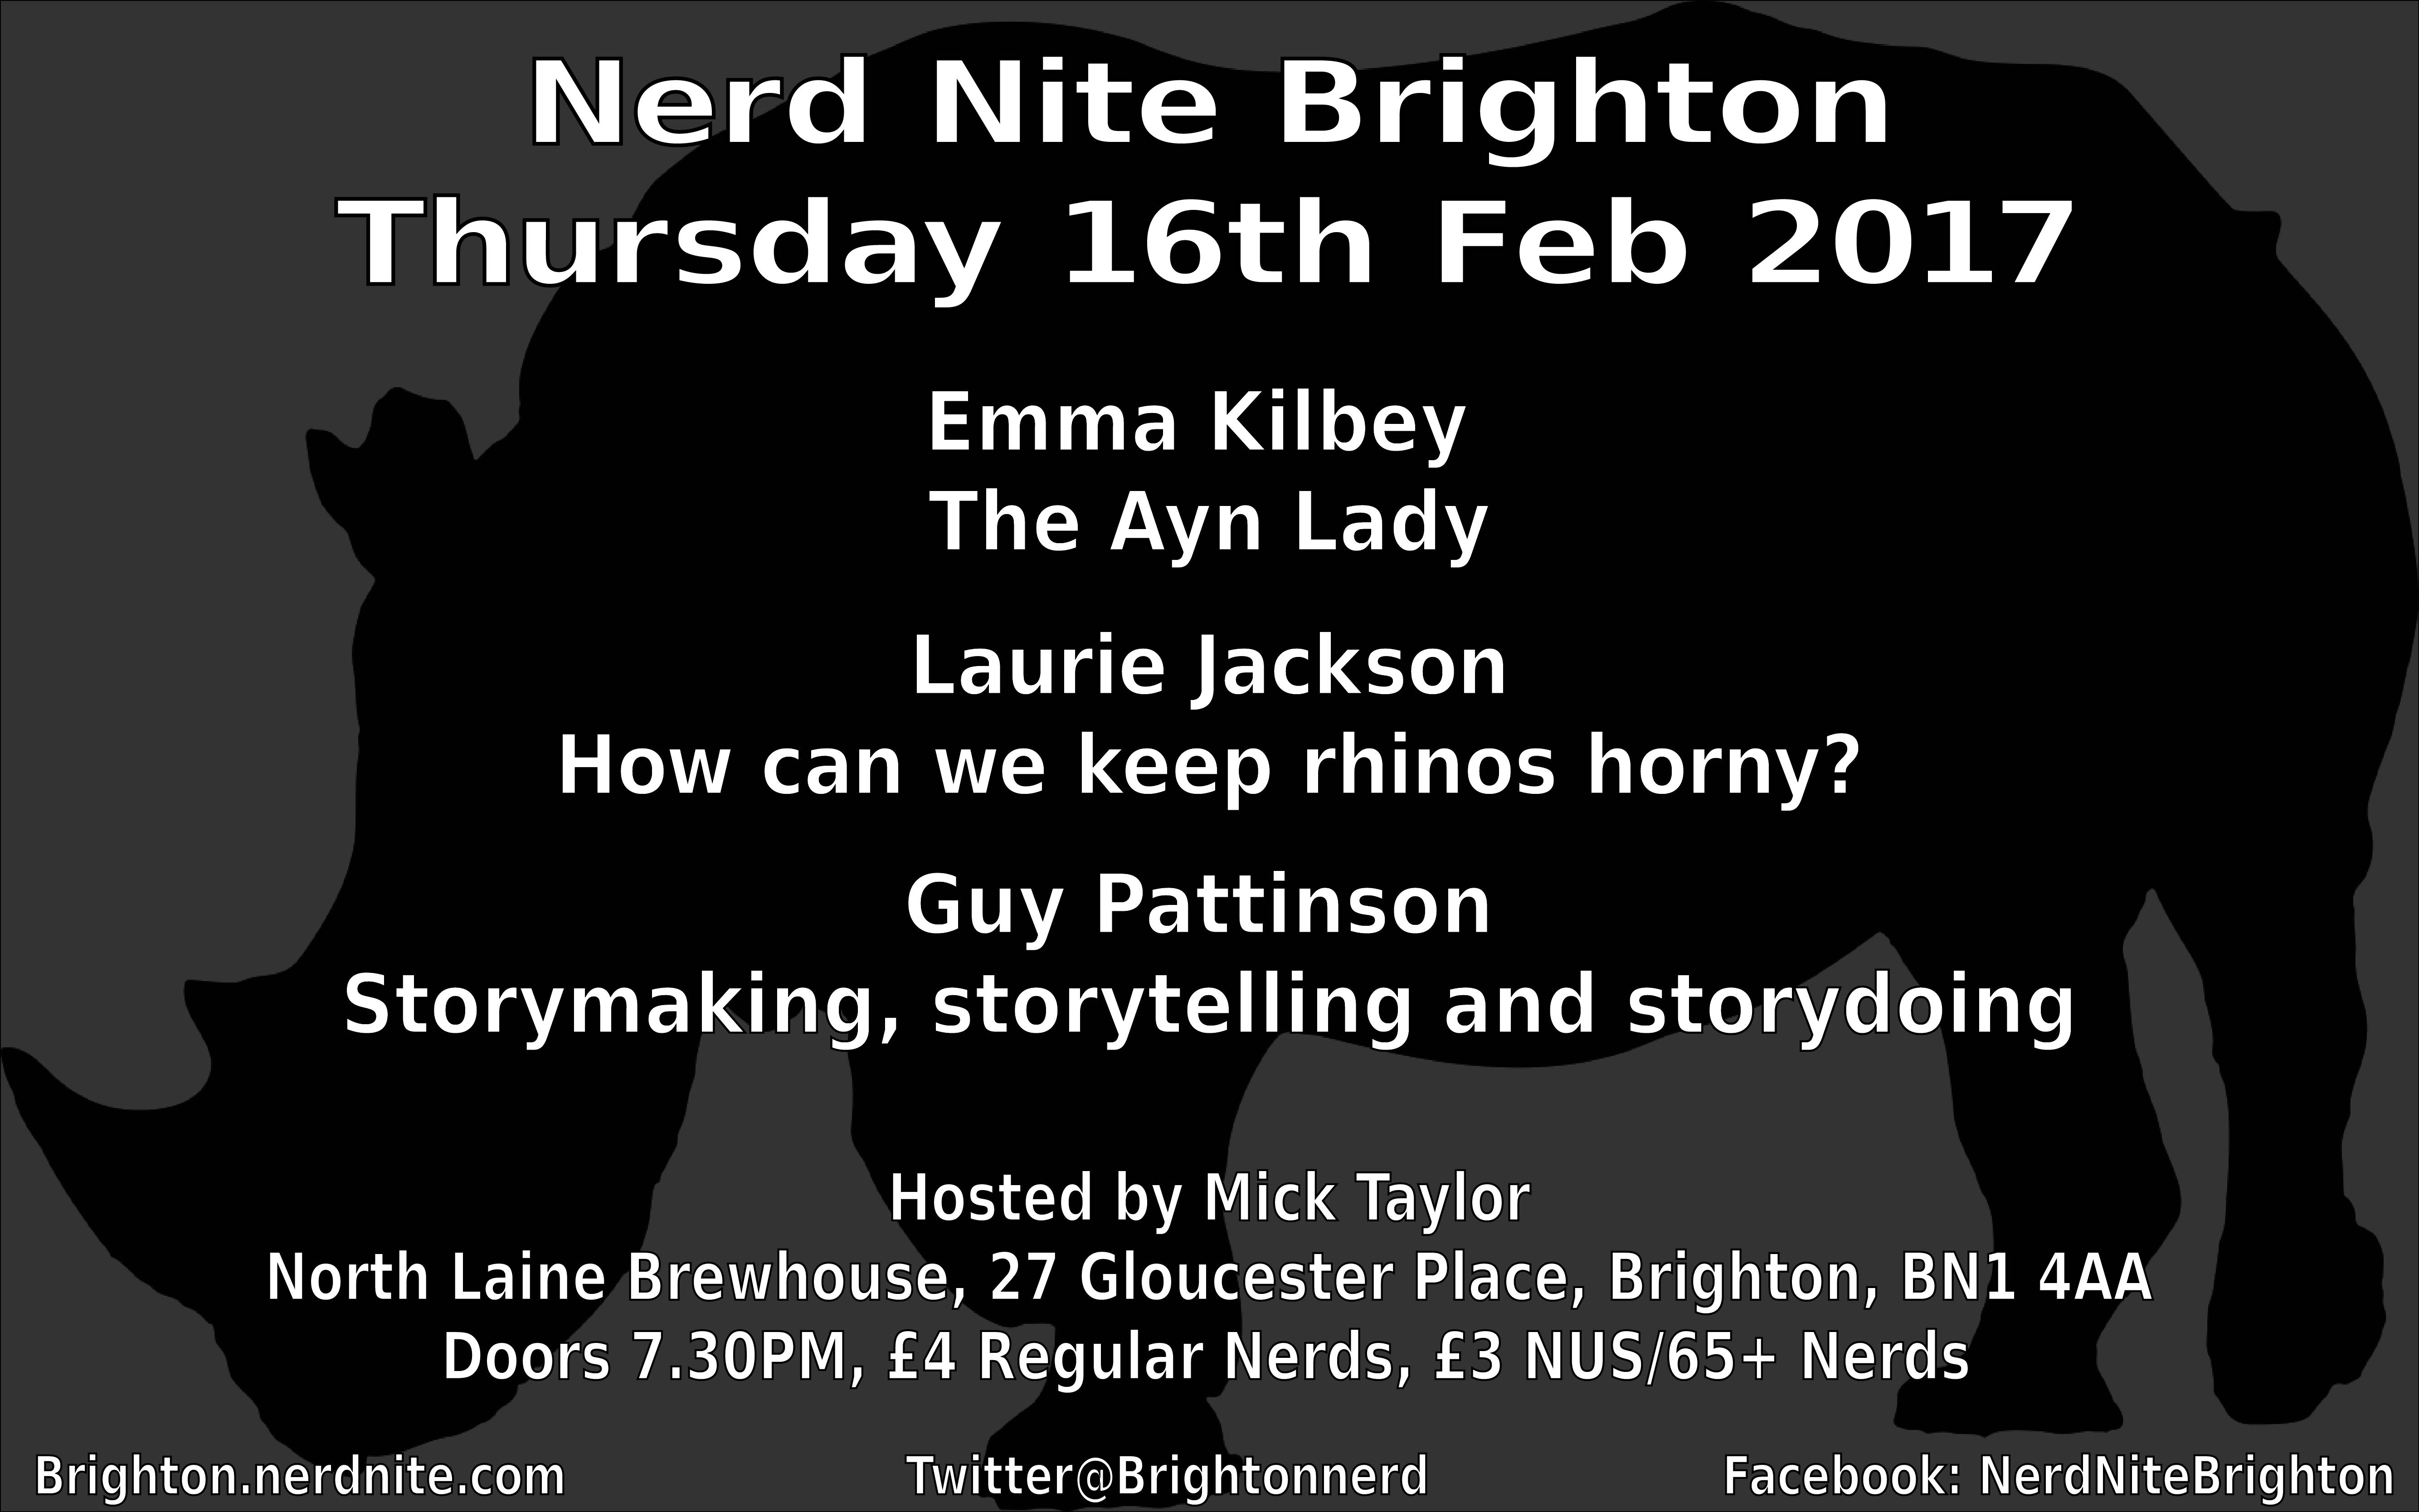 Nerd Nite Brighton Poster, Feb 17